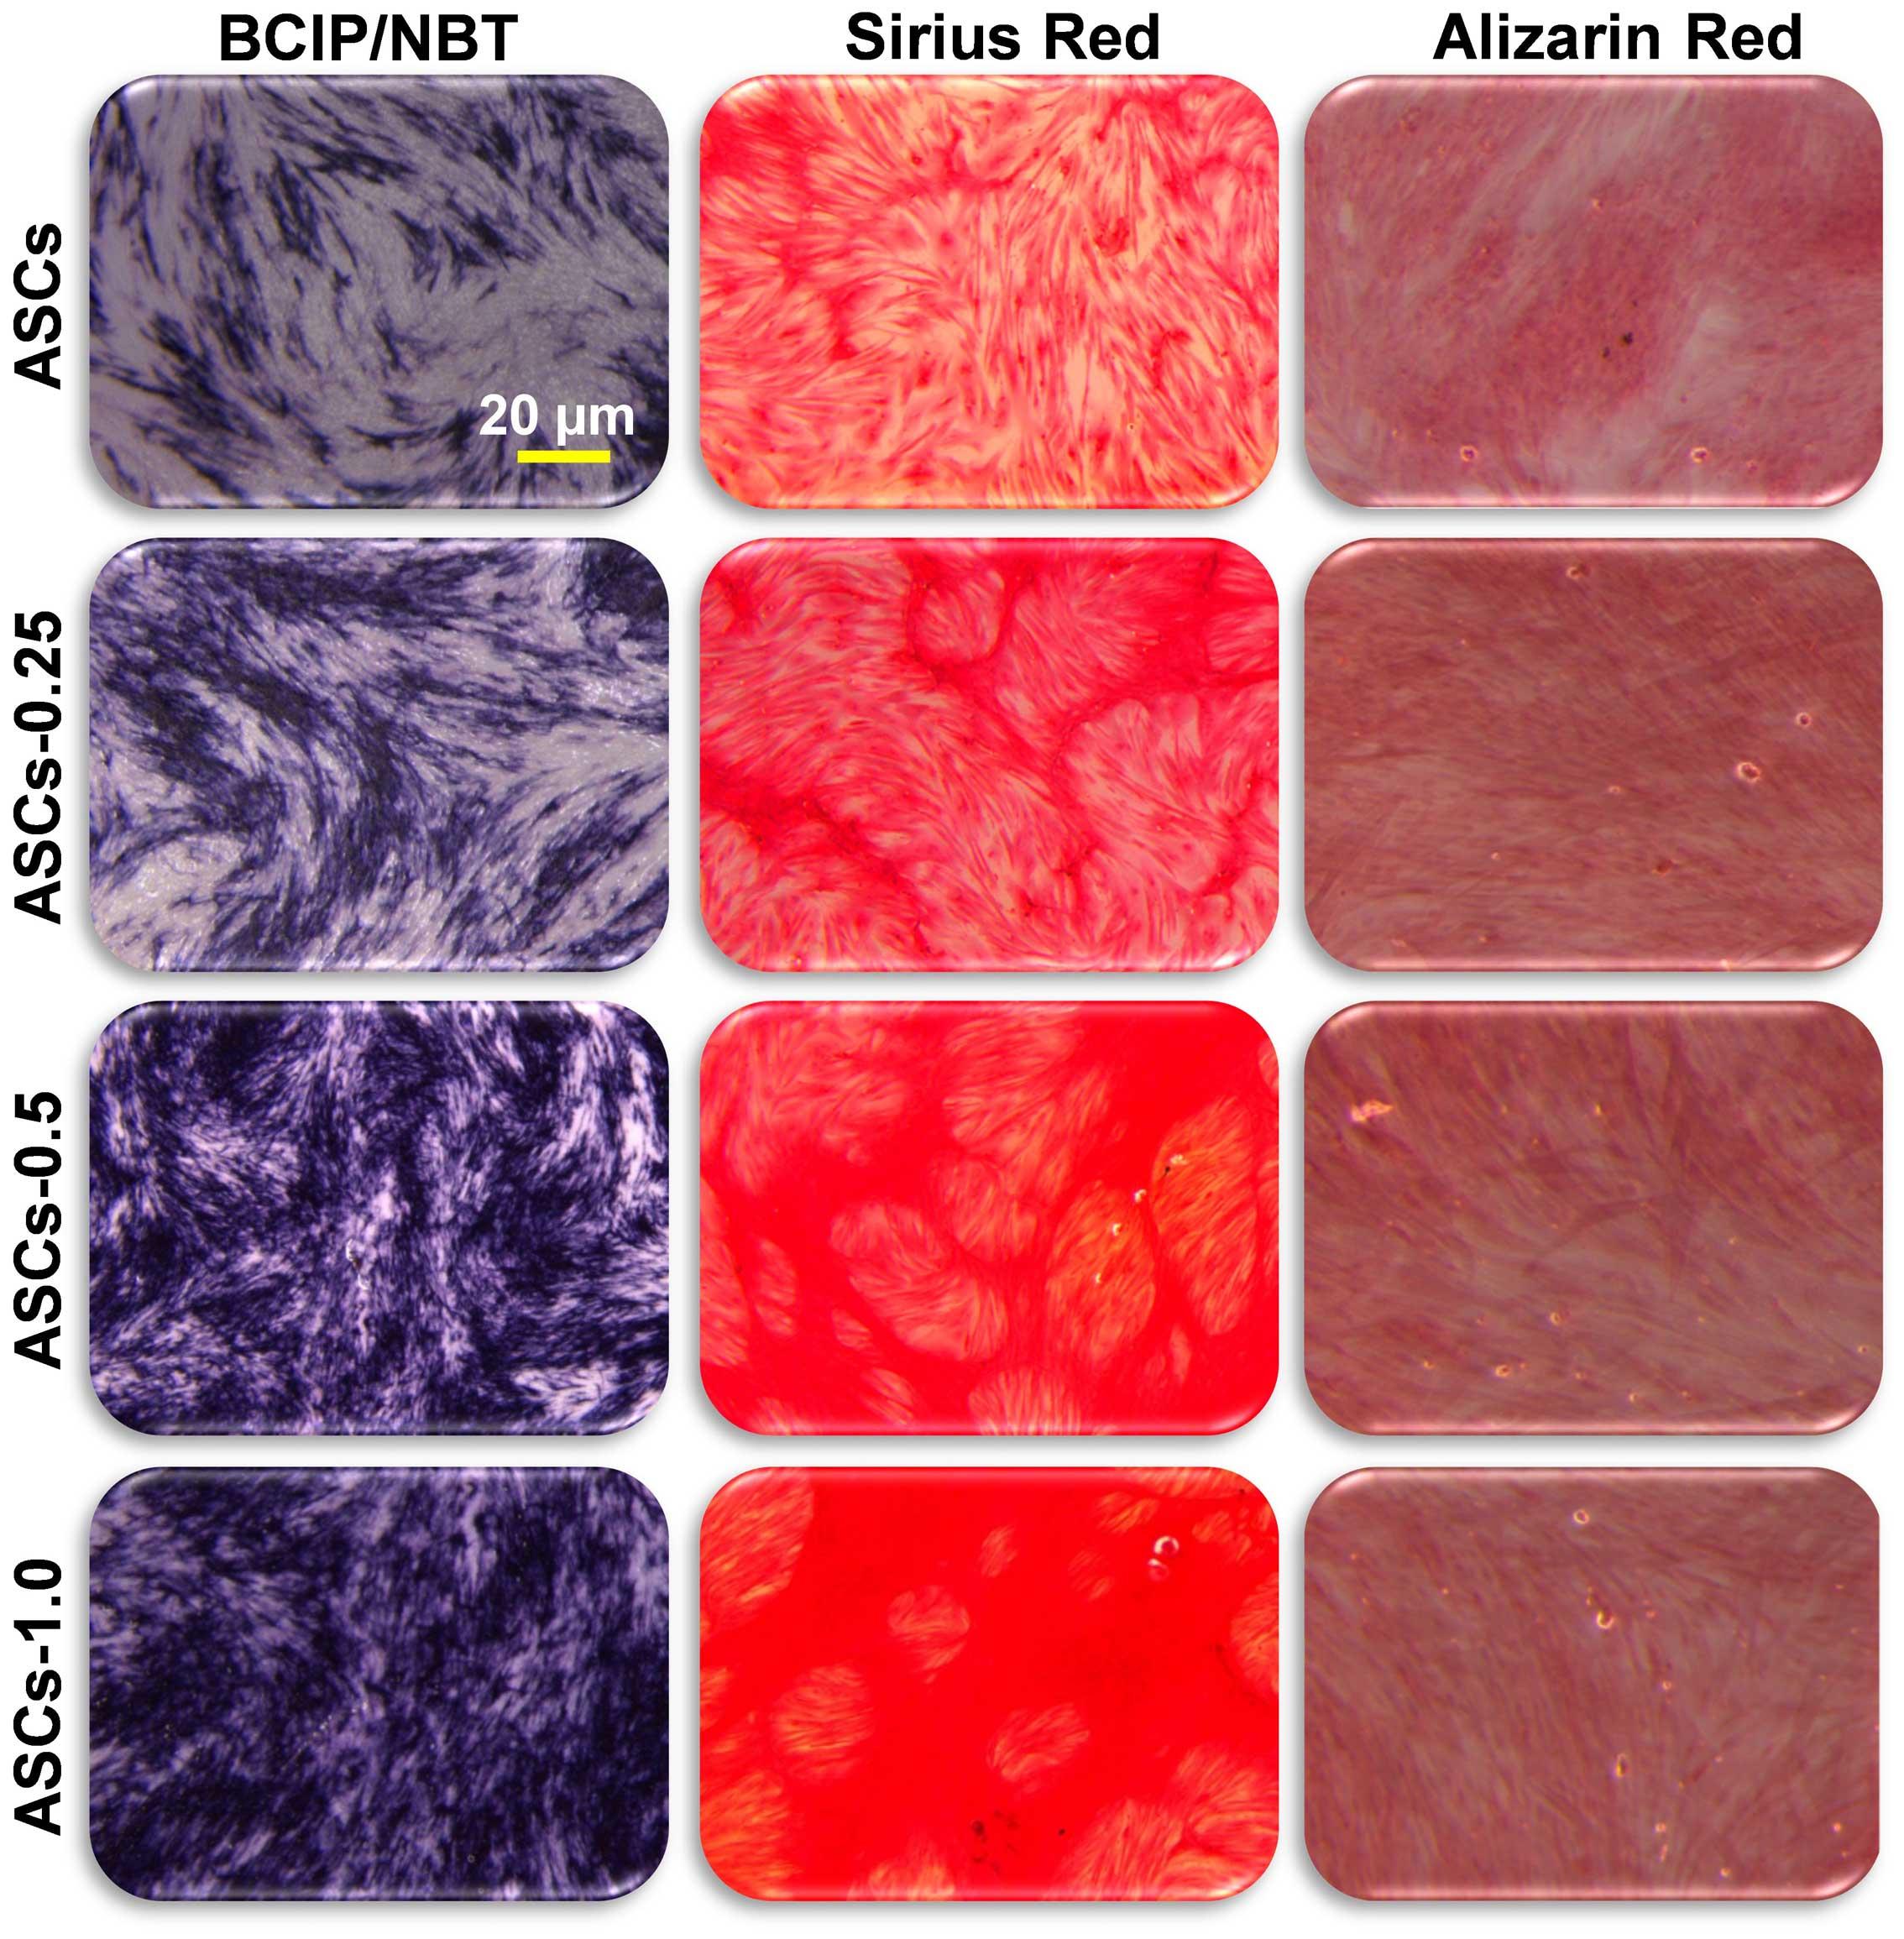 Different staining methods in primary rat osteoblast